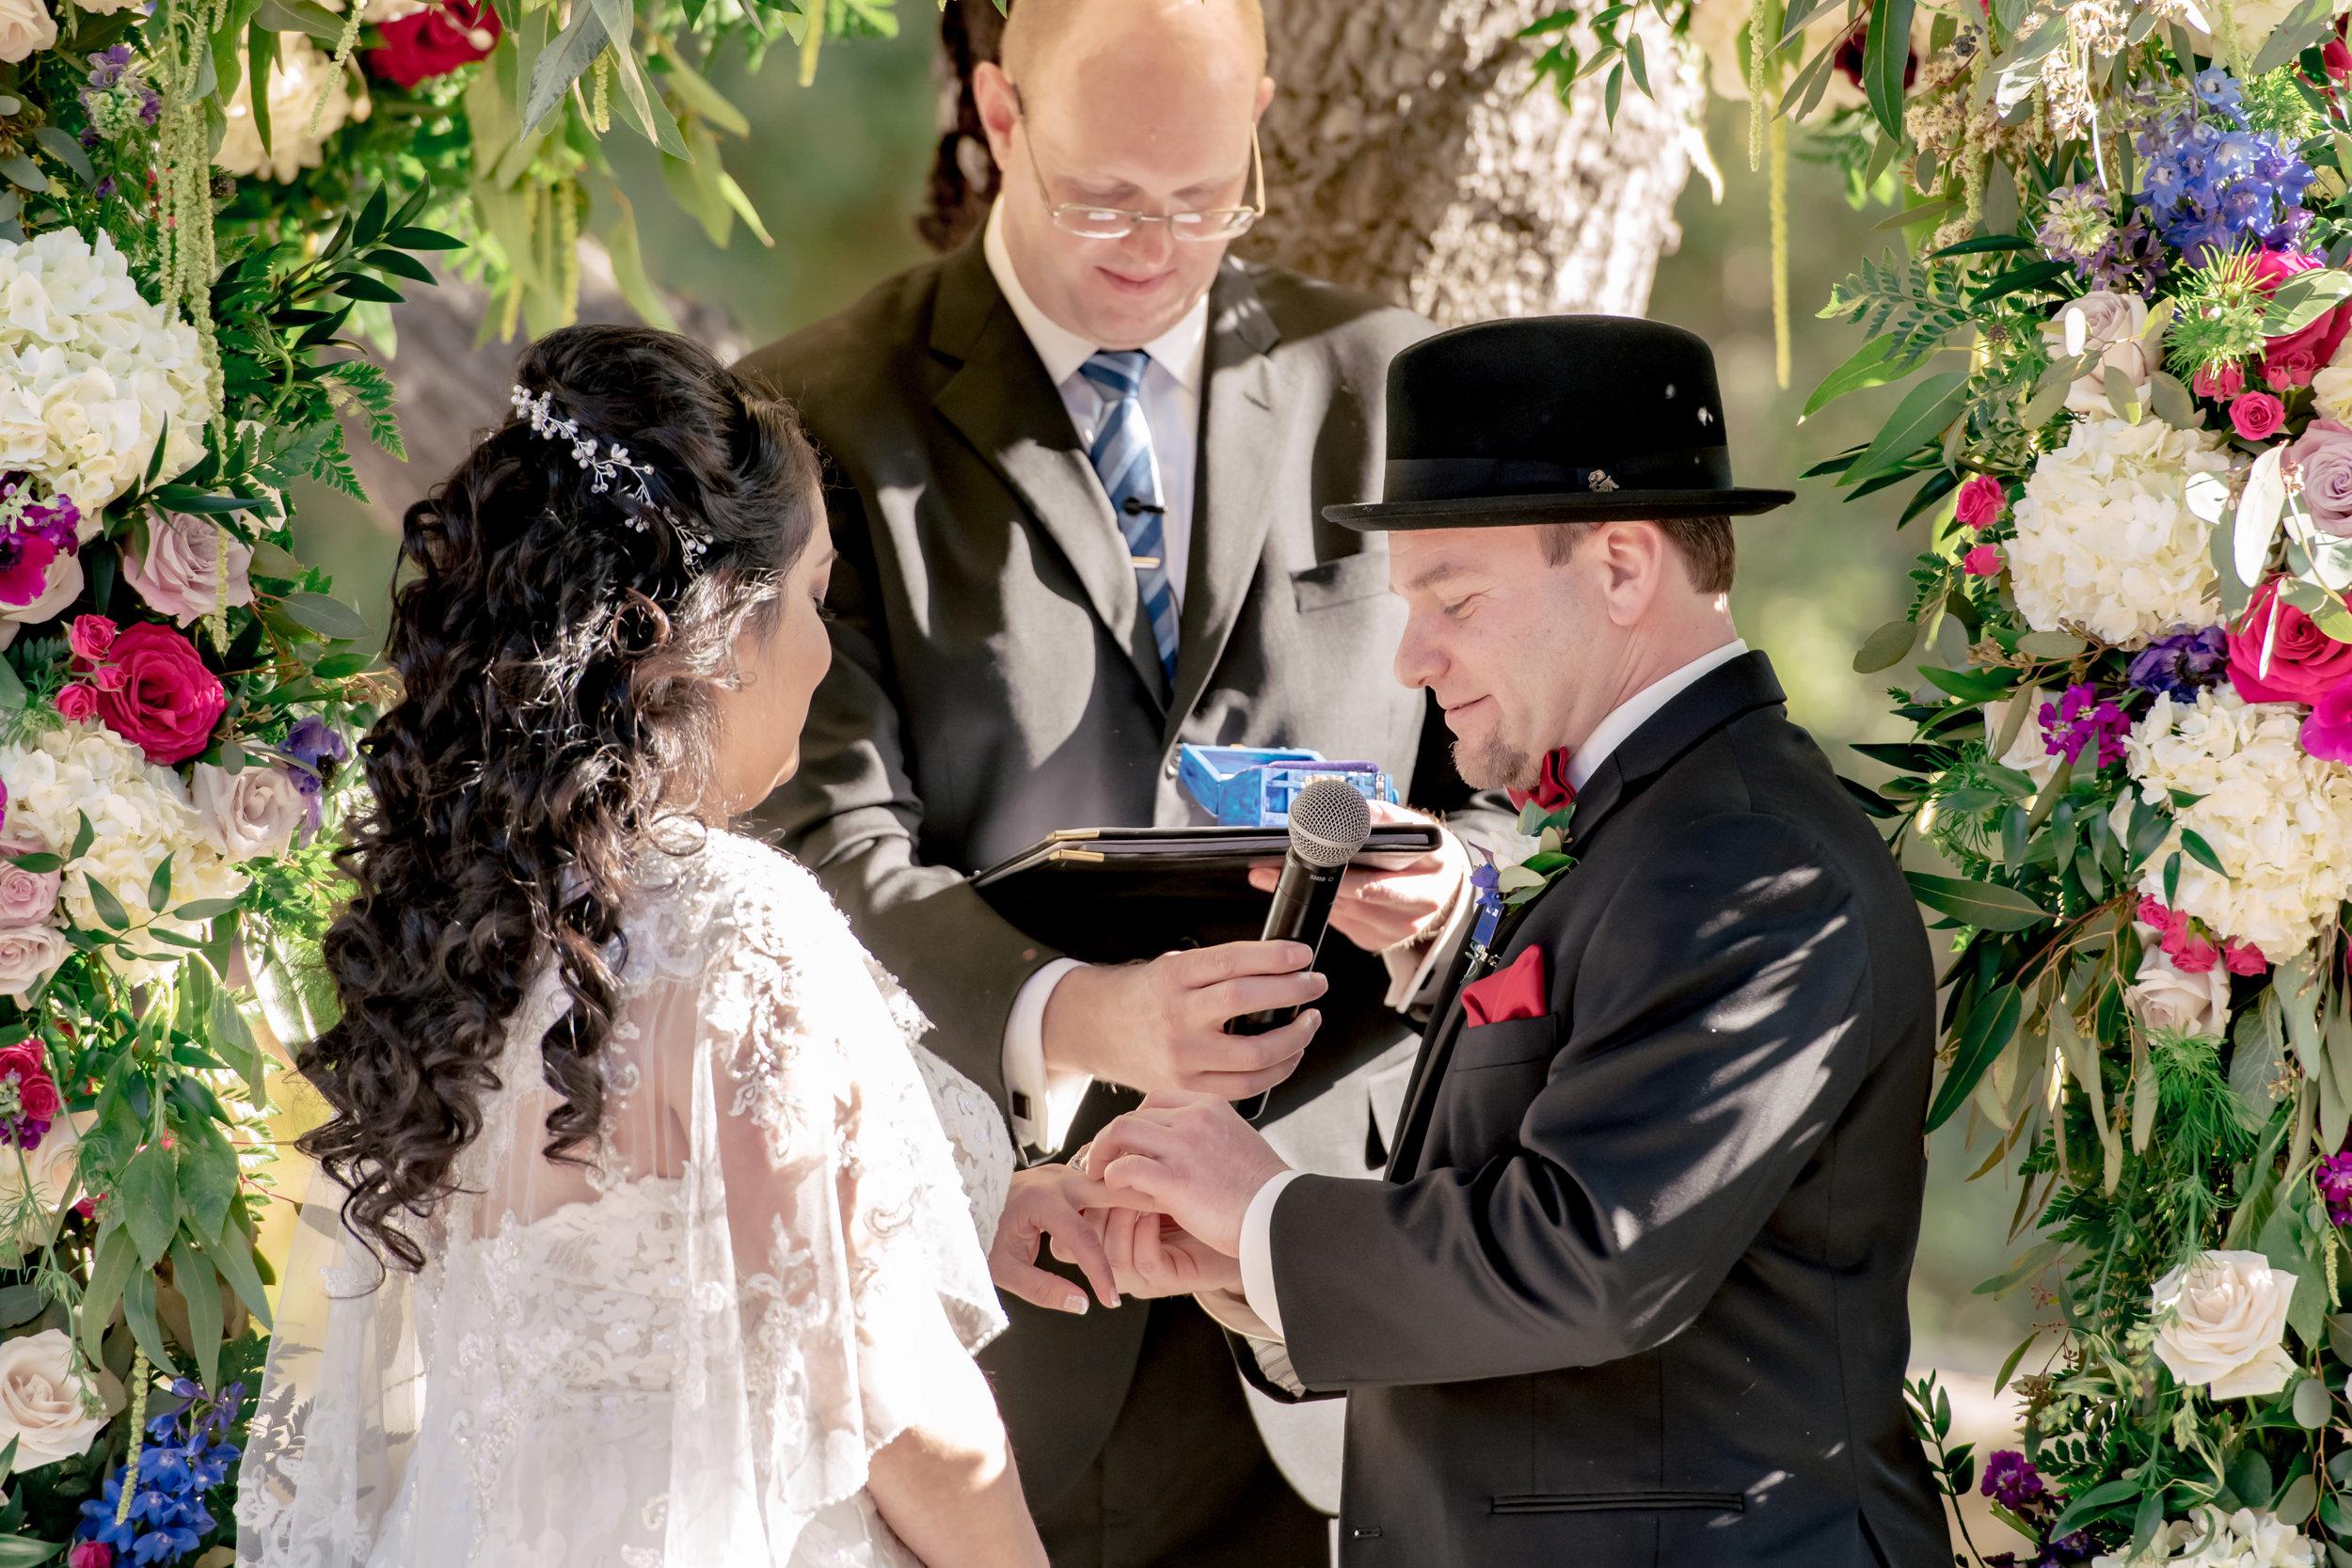 www.santabarbarawedding.com | Rewind Photography | Rockwood Women's Club | Burlap & Bordeaux | Amigo Party Rental | Couple Exchange Rings